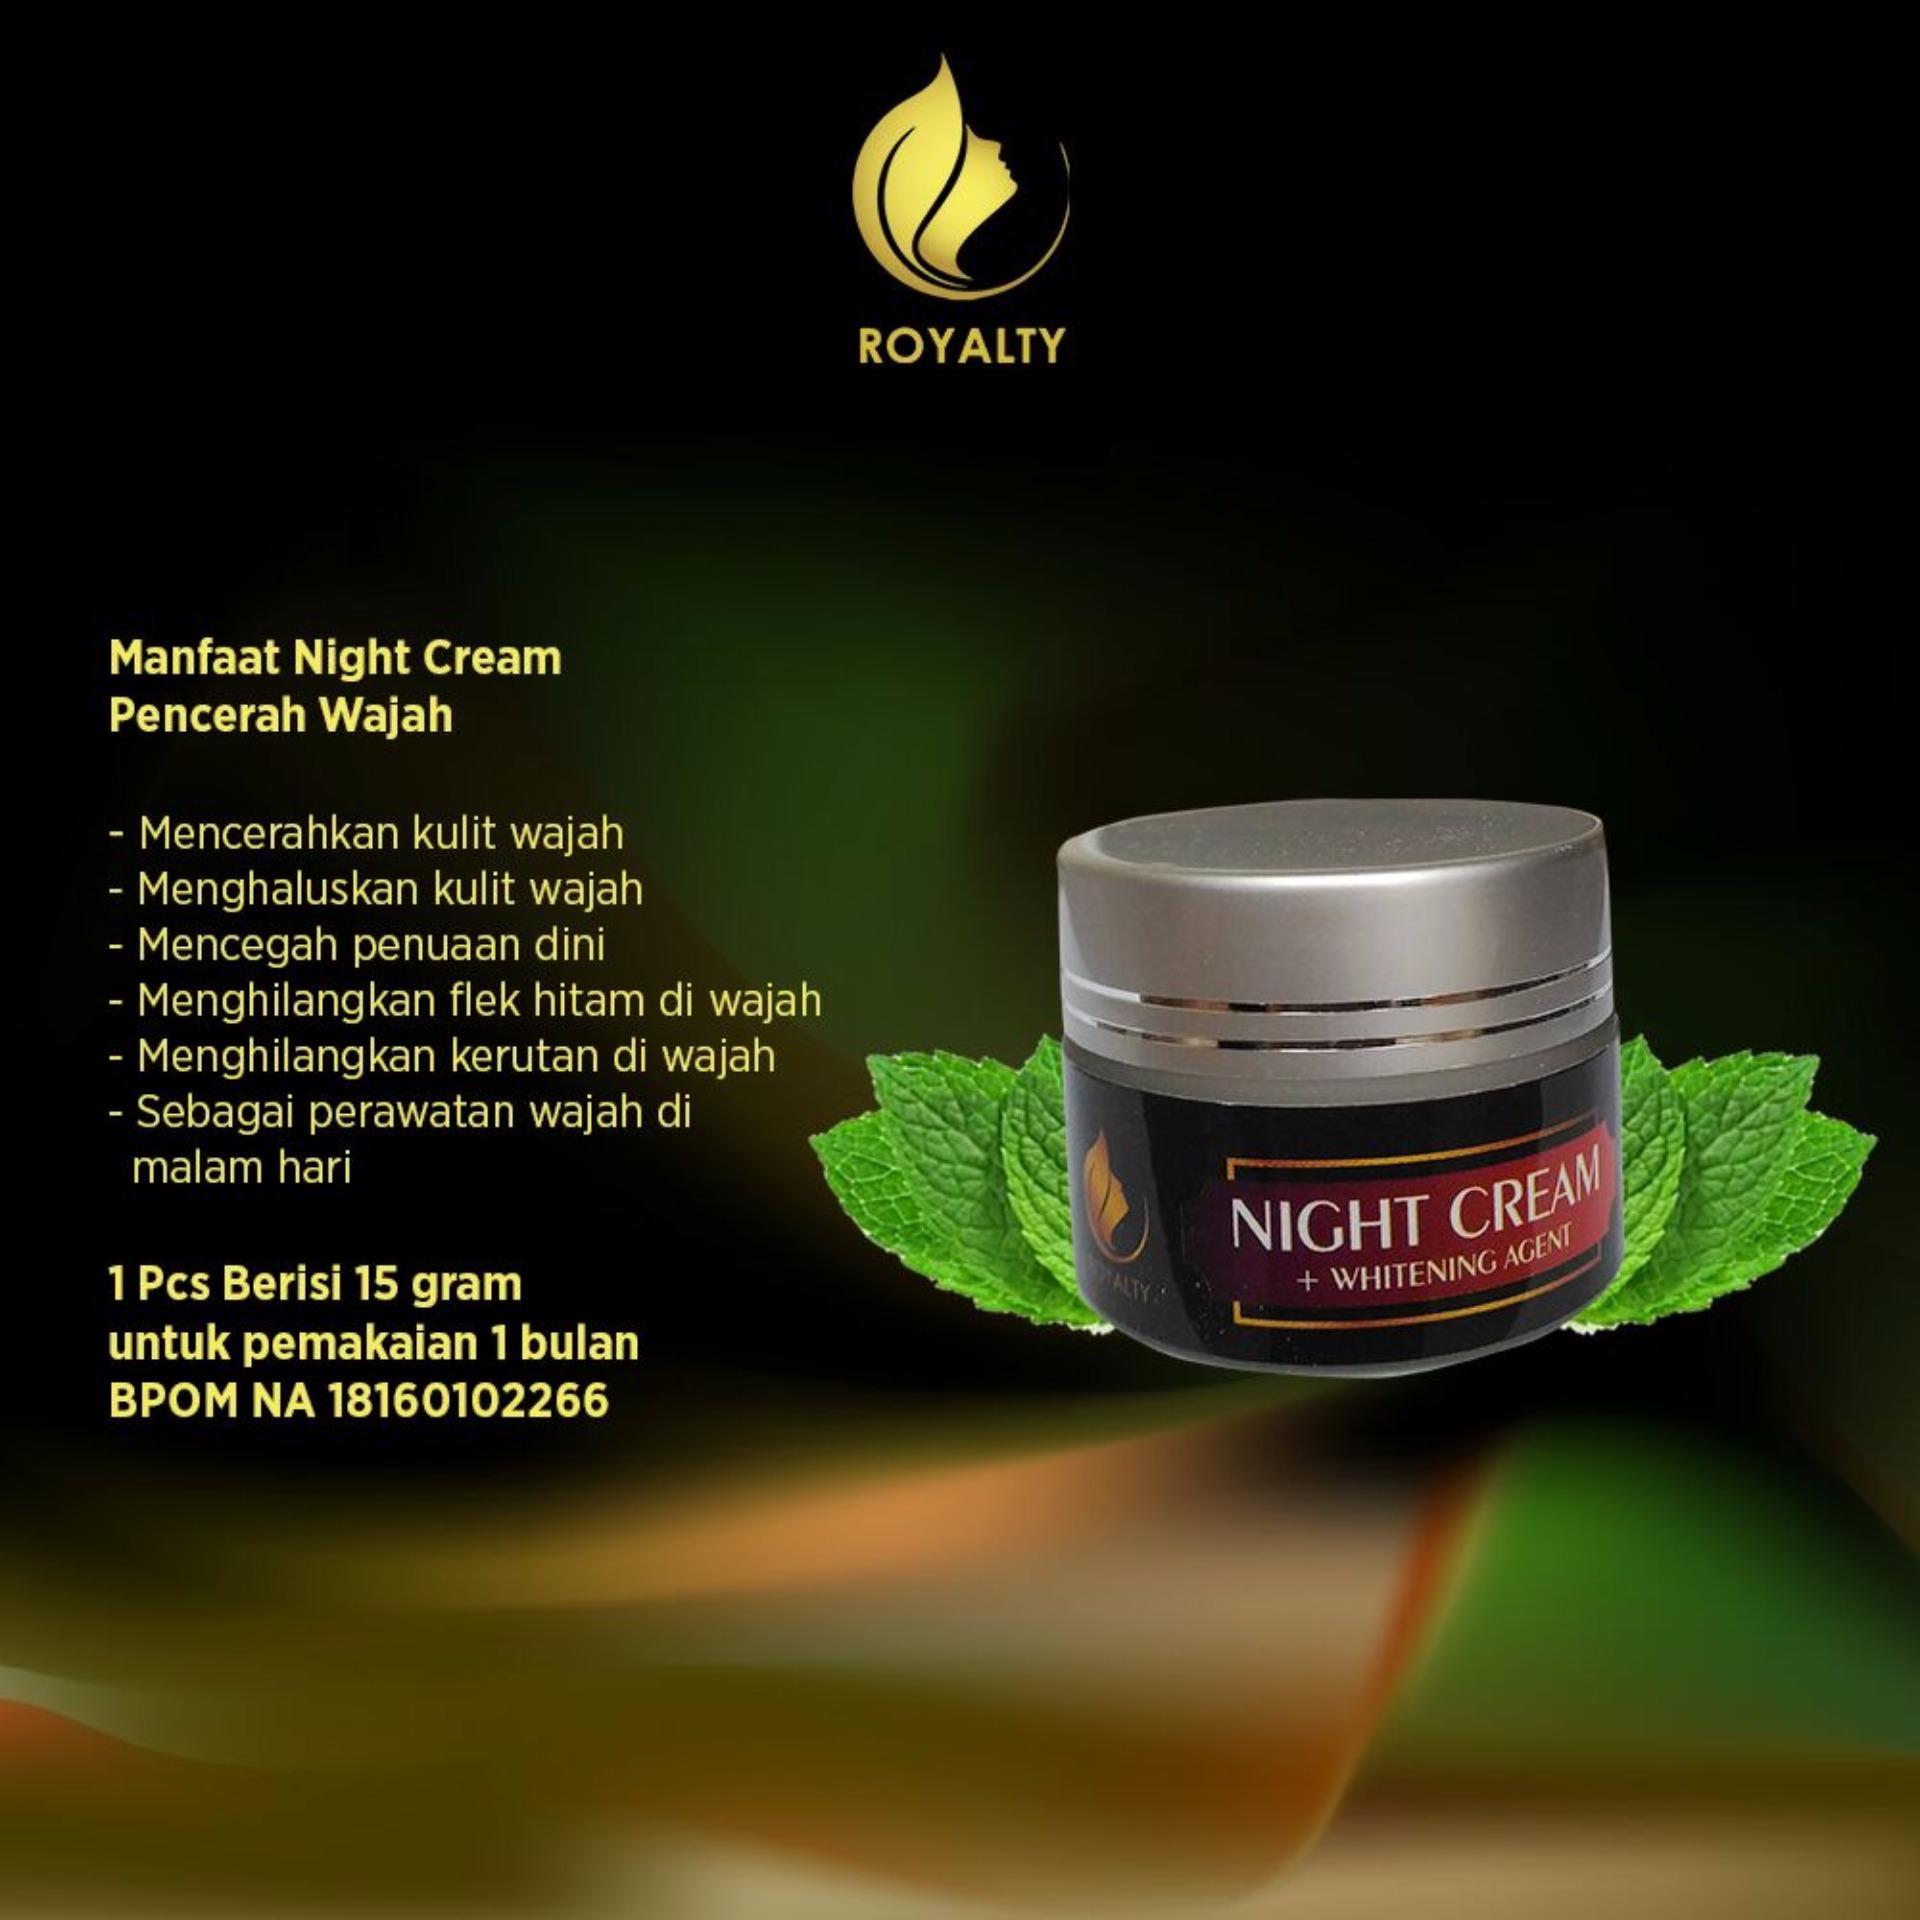 Temulawak Beauty Whitening Cream Siang Malam Original Hologam Emas Krim Day Night Pot Kuning Holo Super Light 50gr Source Perawatan Pemutih Wajah Tercepat